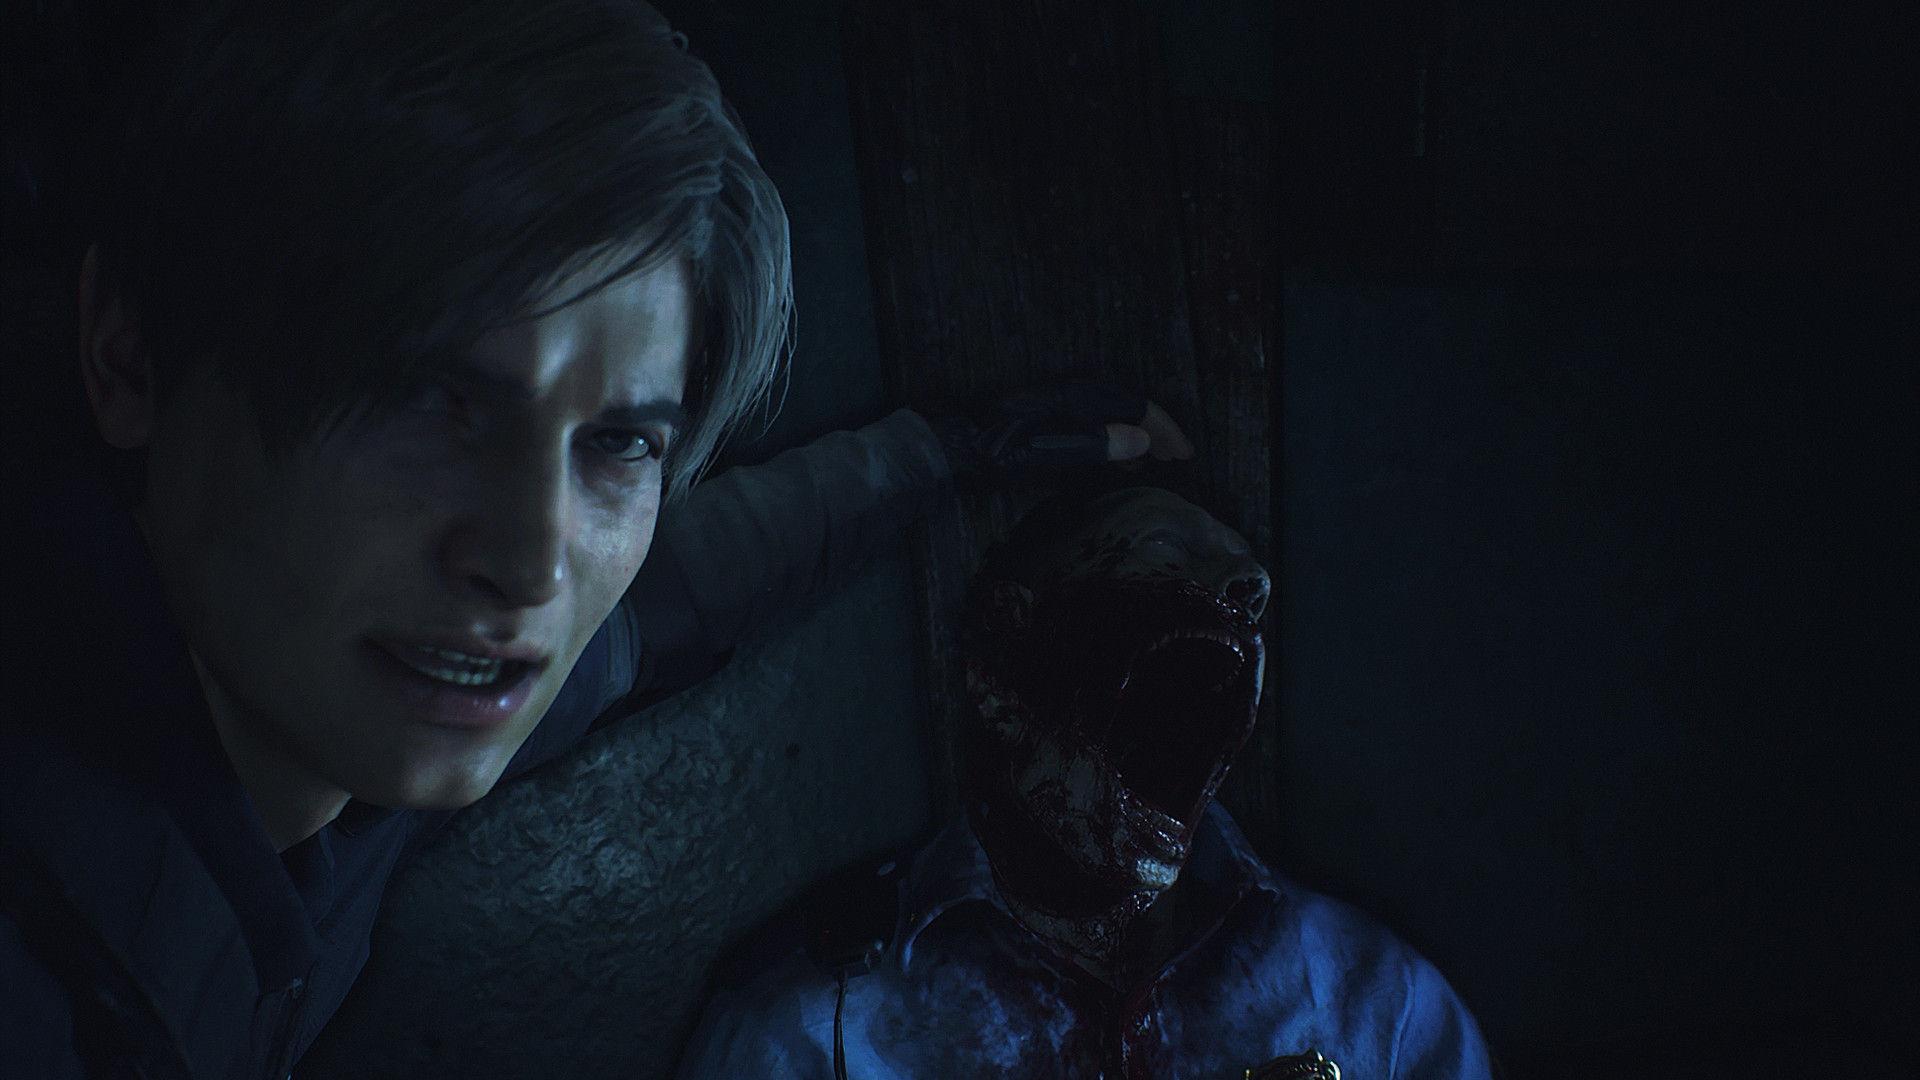 ЗОМБАРИ ВЕРНУЛИСЬ Resident Evil 2 Remake #1 - YouTube